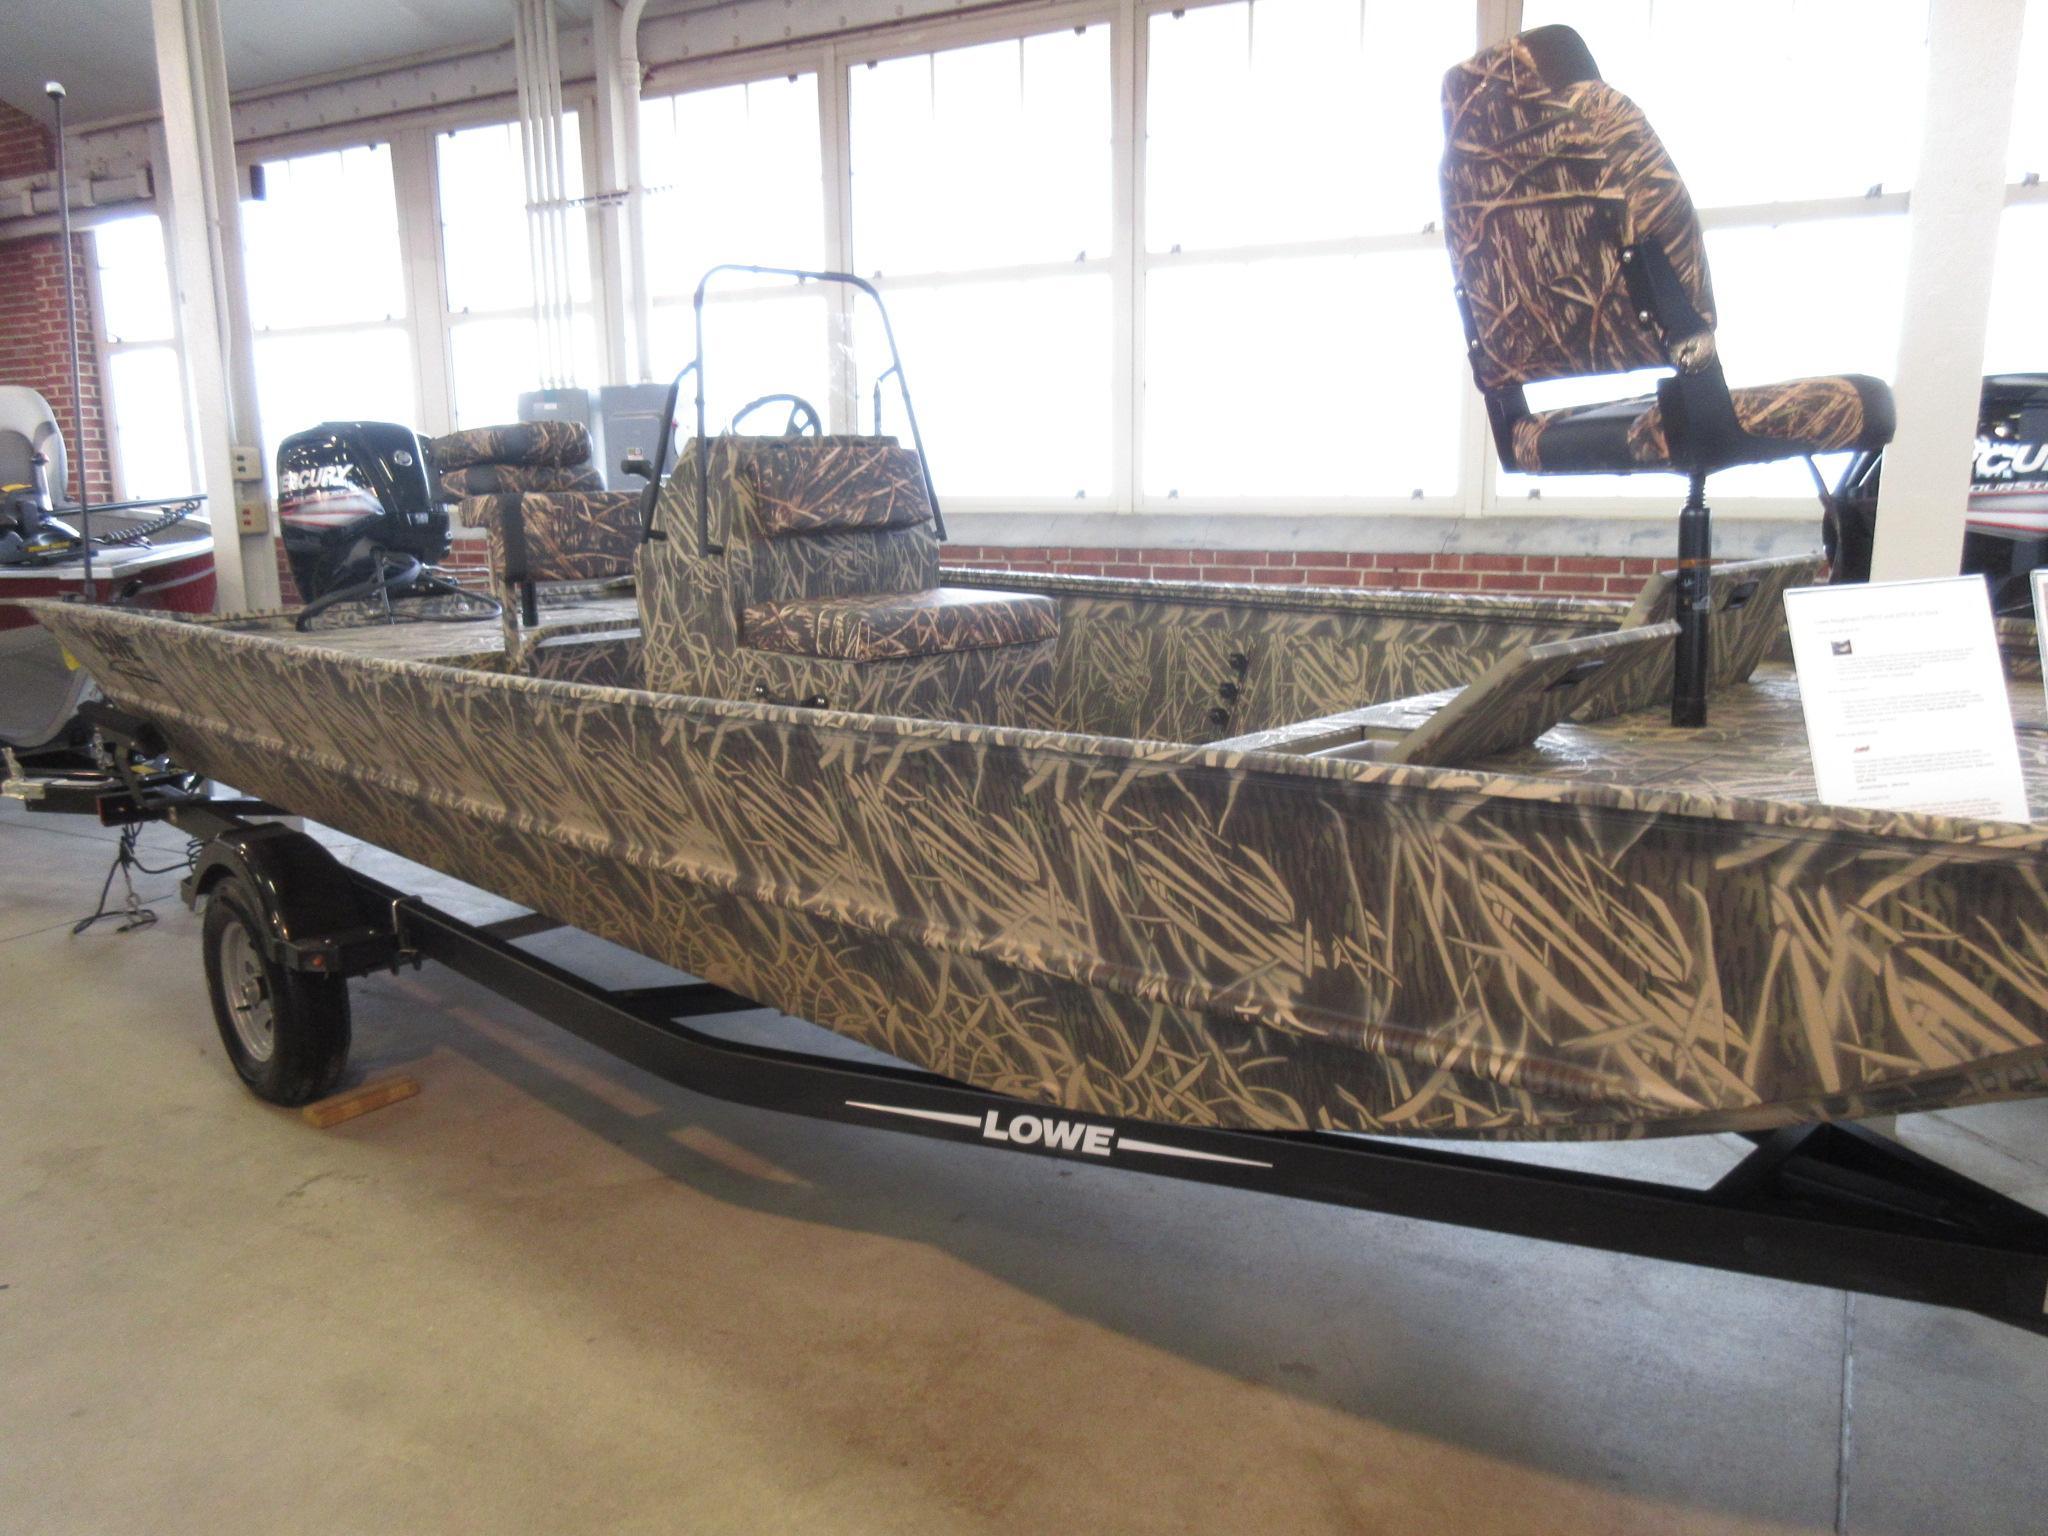 roughneck 2070 cc lowe boats - HD2048×1536